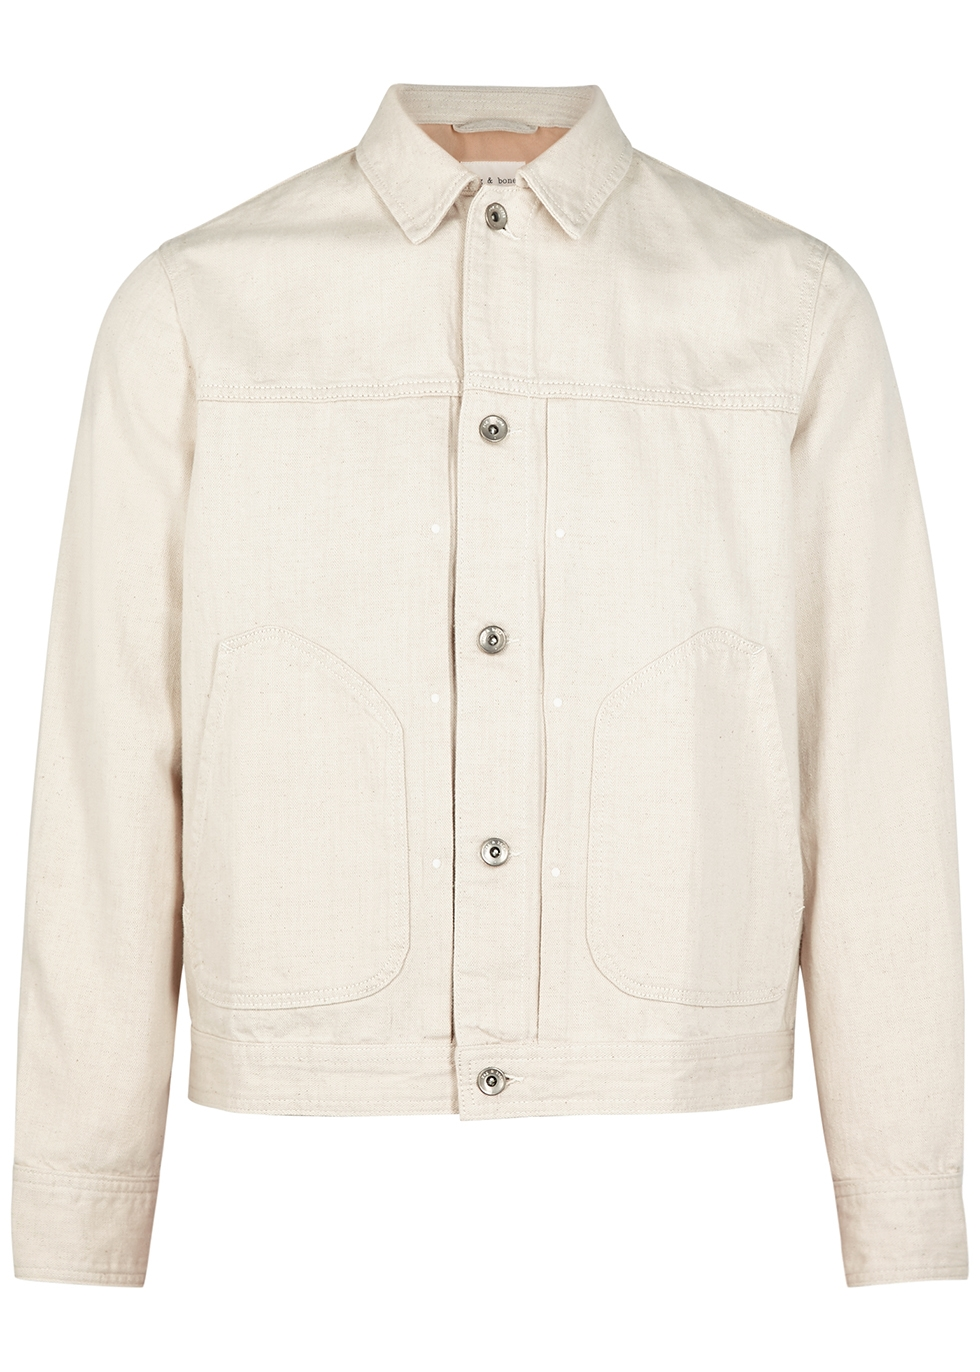 Off-white cotton-blend jacket